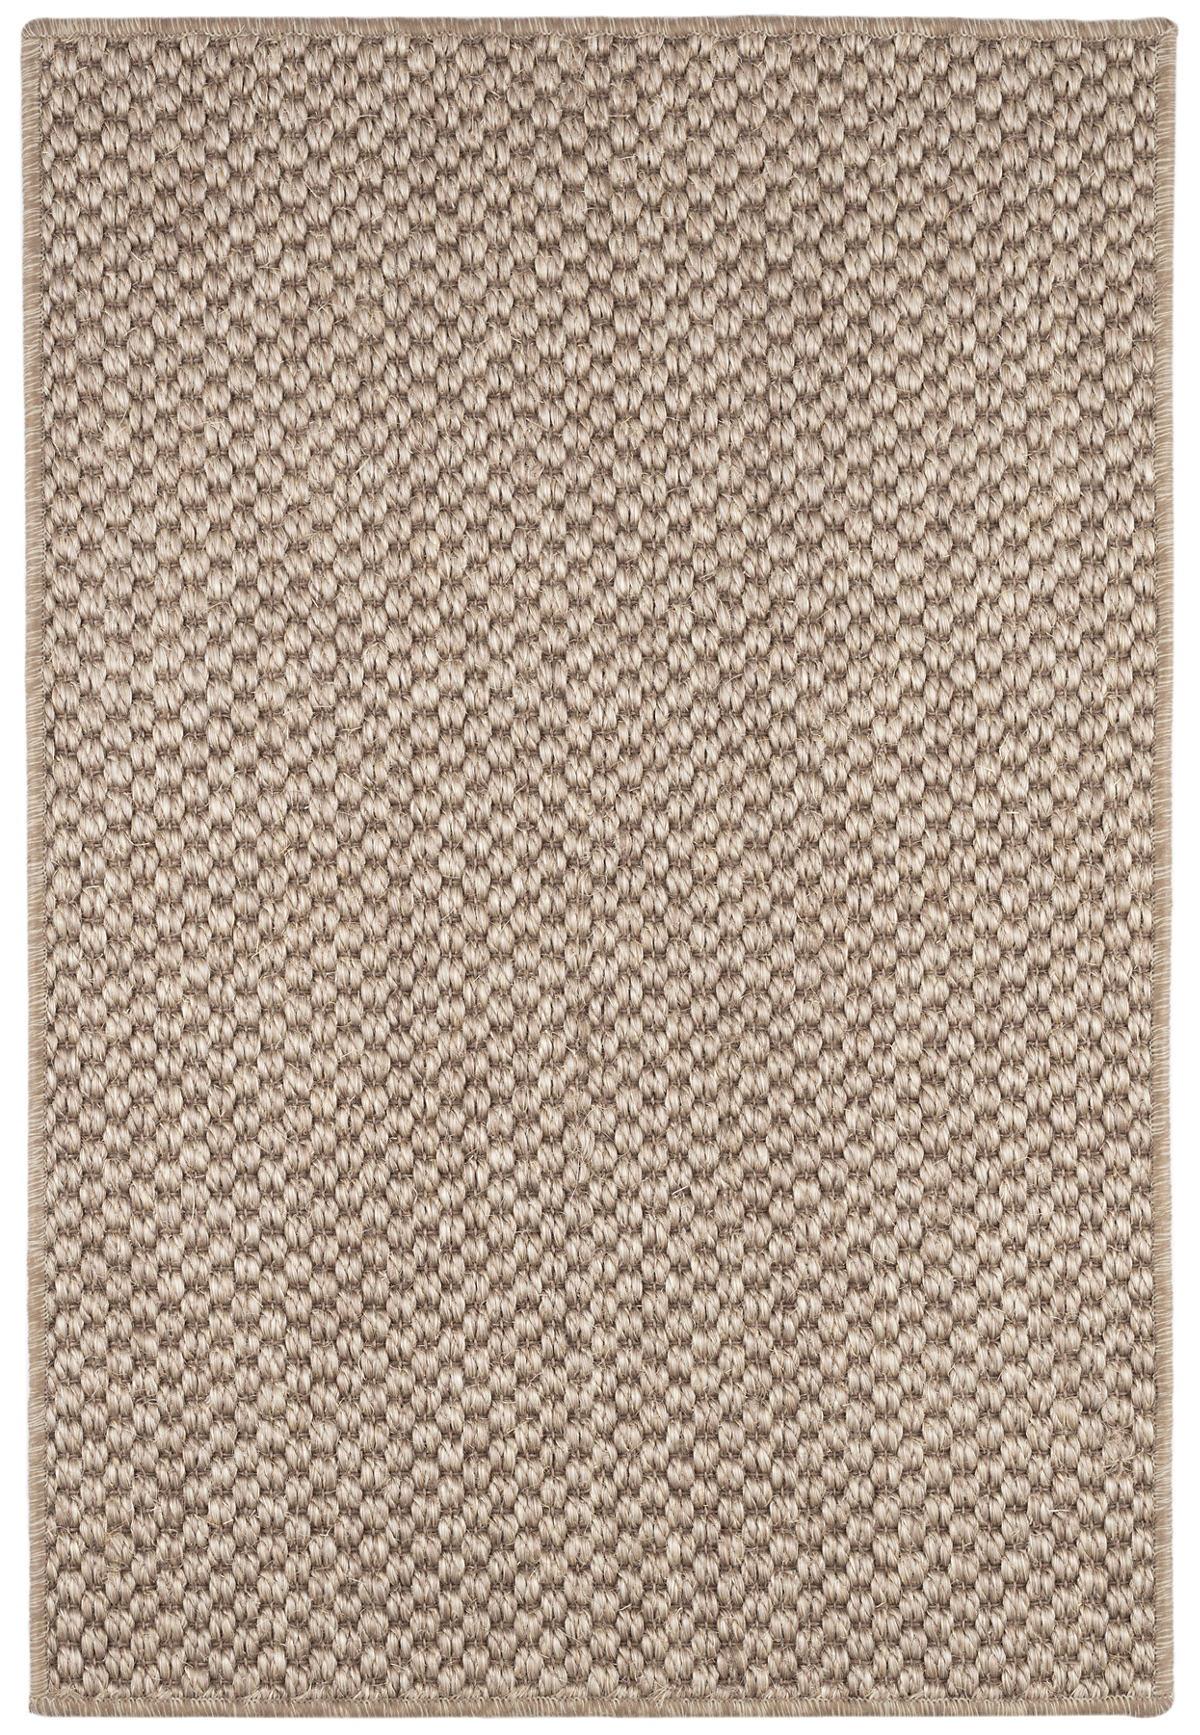 Corden Taupe Woven Sisal Custom Rug With Pad